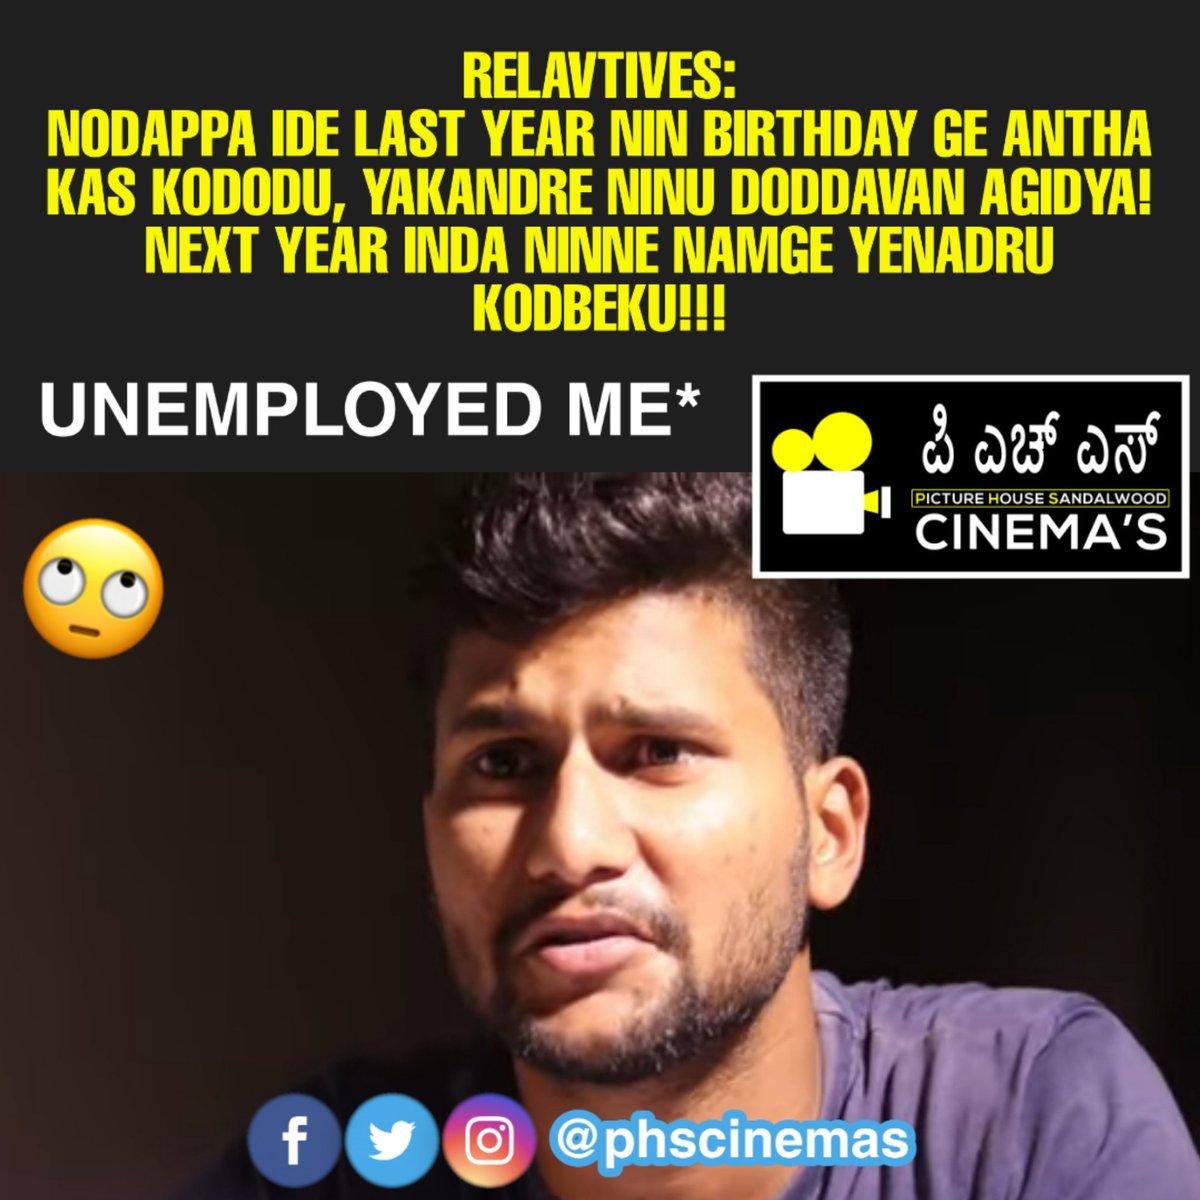 #phs #phscinemas #unemployment #unemployed #relatives #birthday #kannada #kannadamovies #kannadafilms #nammakarnatakamemes #kannadamemespic.twitter.com/ccPmO0XNnp